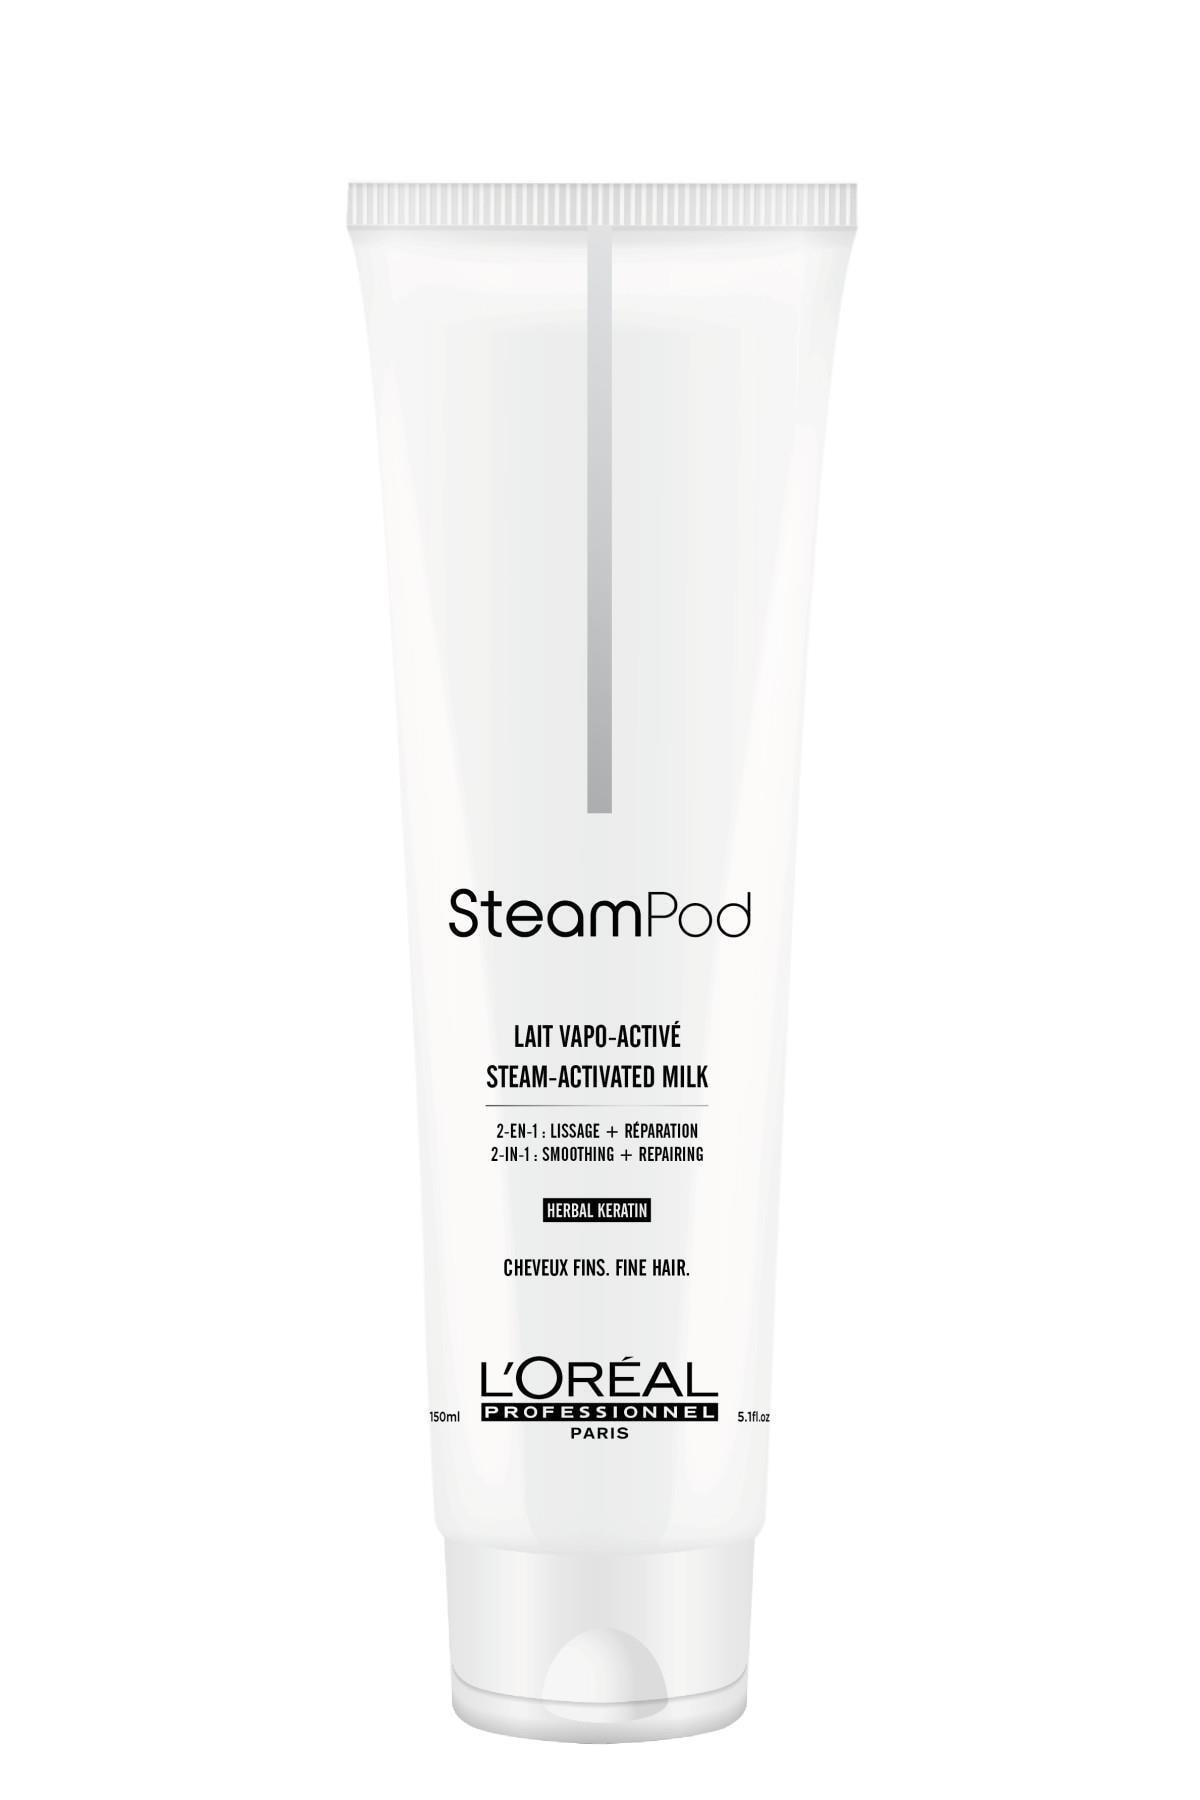 L'oreal Professionnel Steampod İnce Saçlar için Keratin Süt 150 ml 3474630692855 1